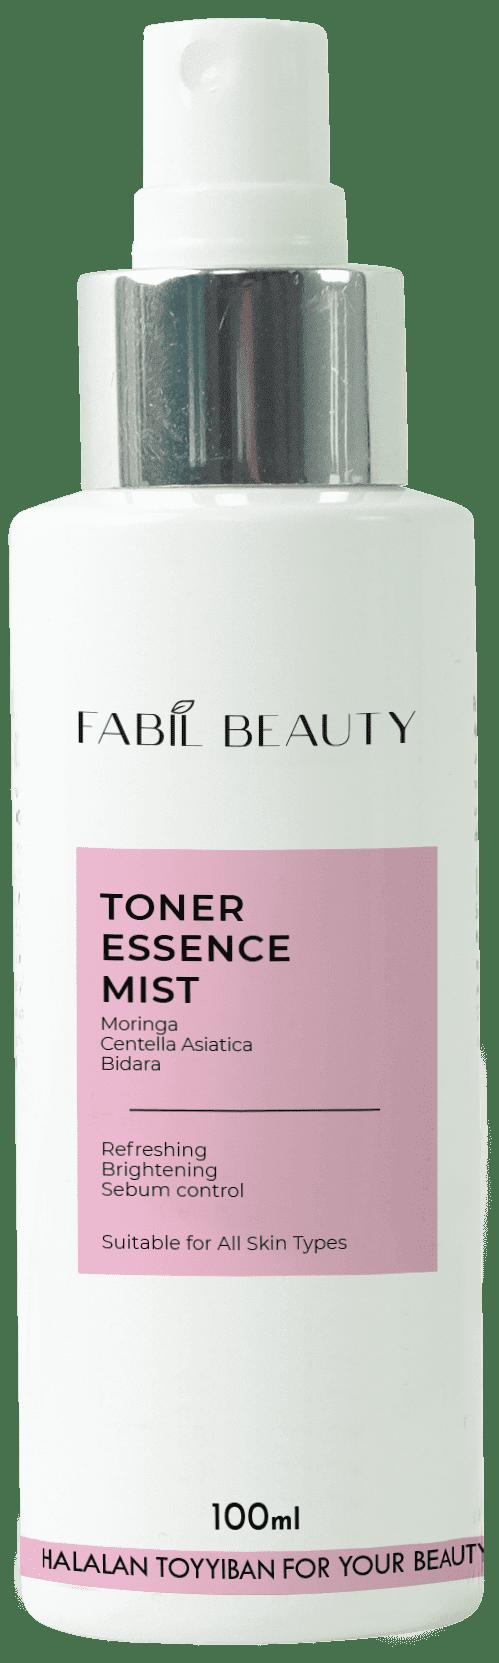 Fabil Toner Essence Mist